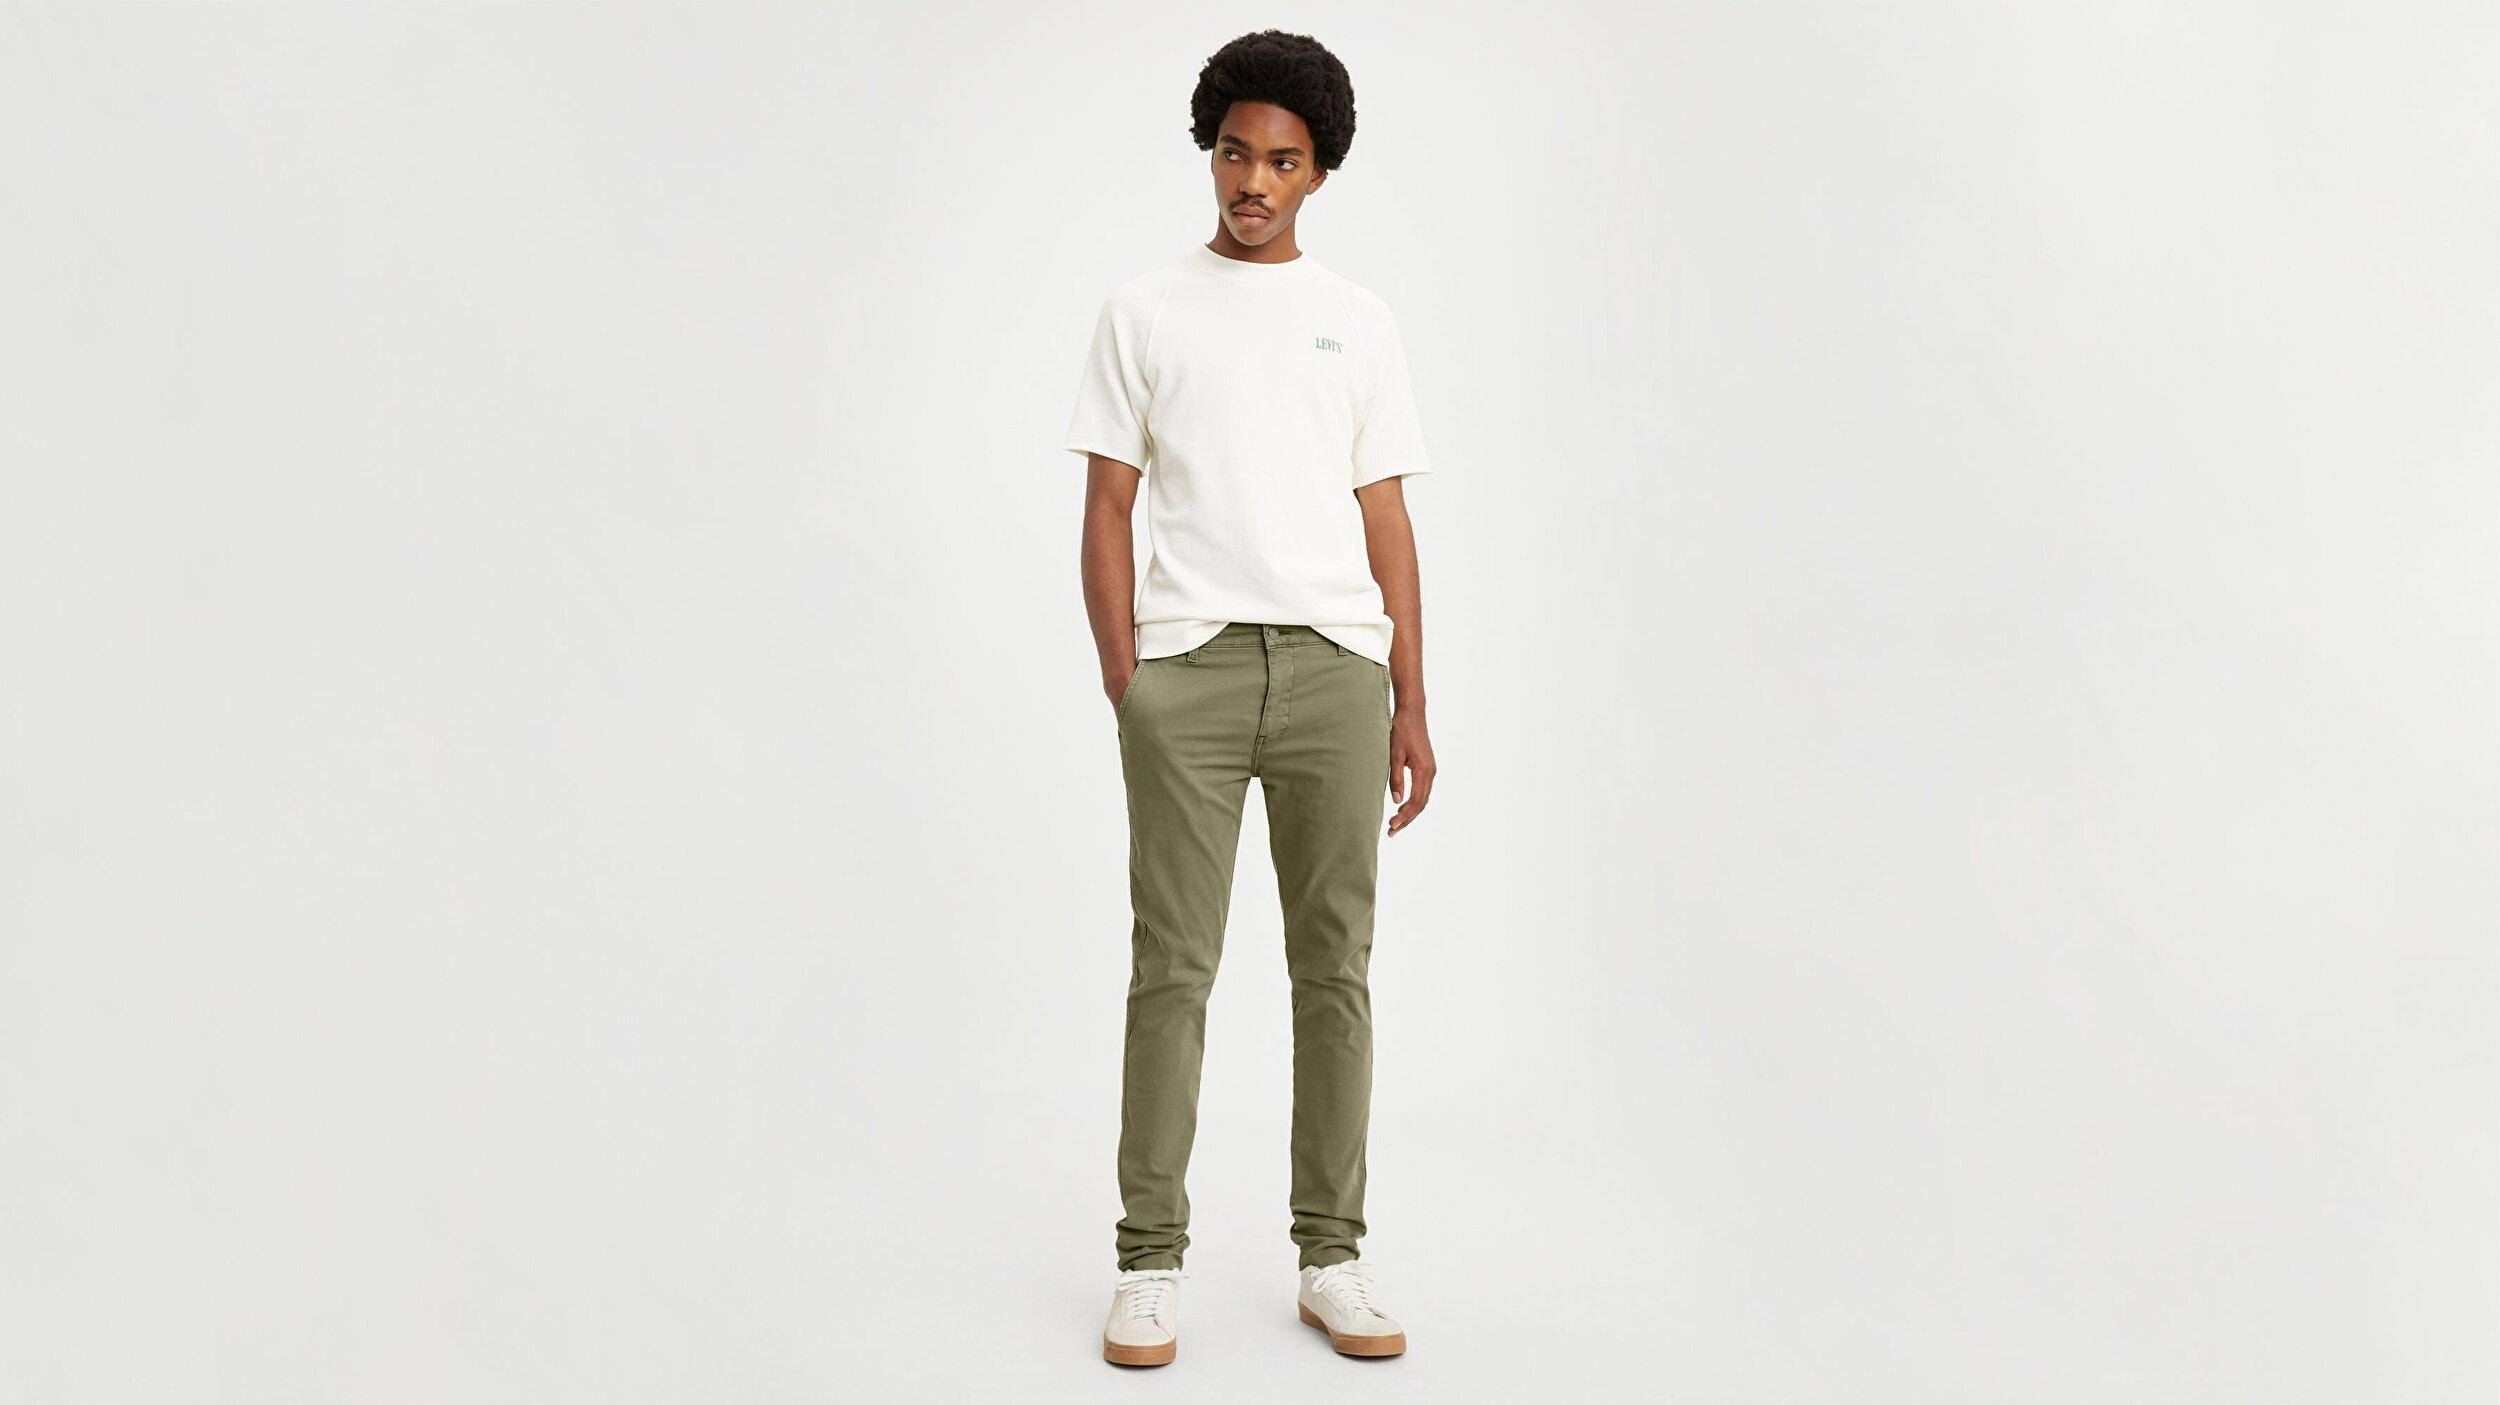 XX Chino Slim Fit Erkek Pantolon-Bunker  Shady Gd Ccu B